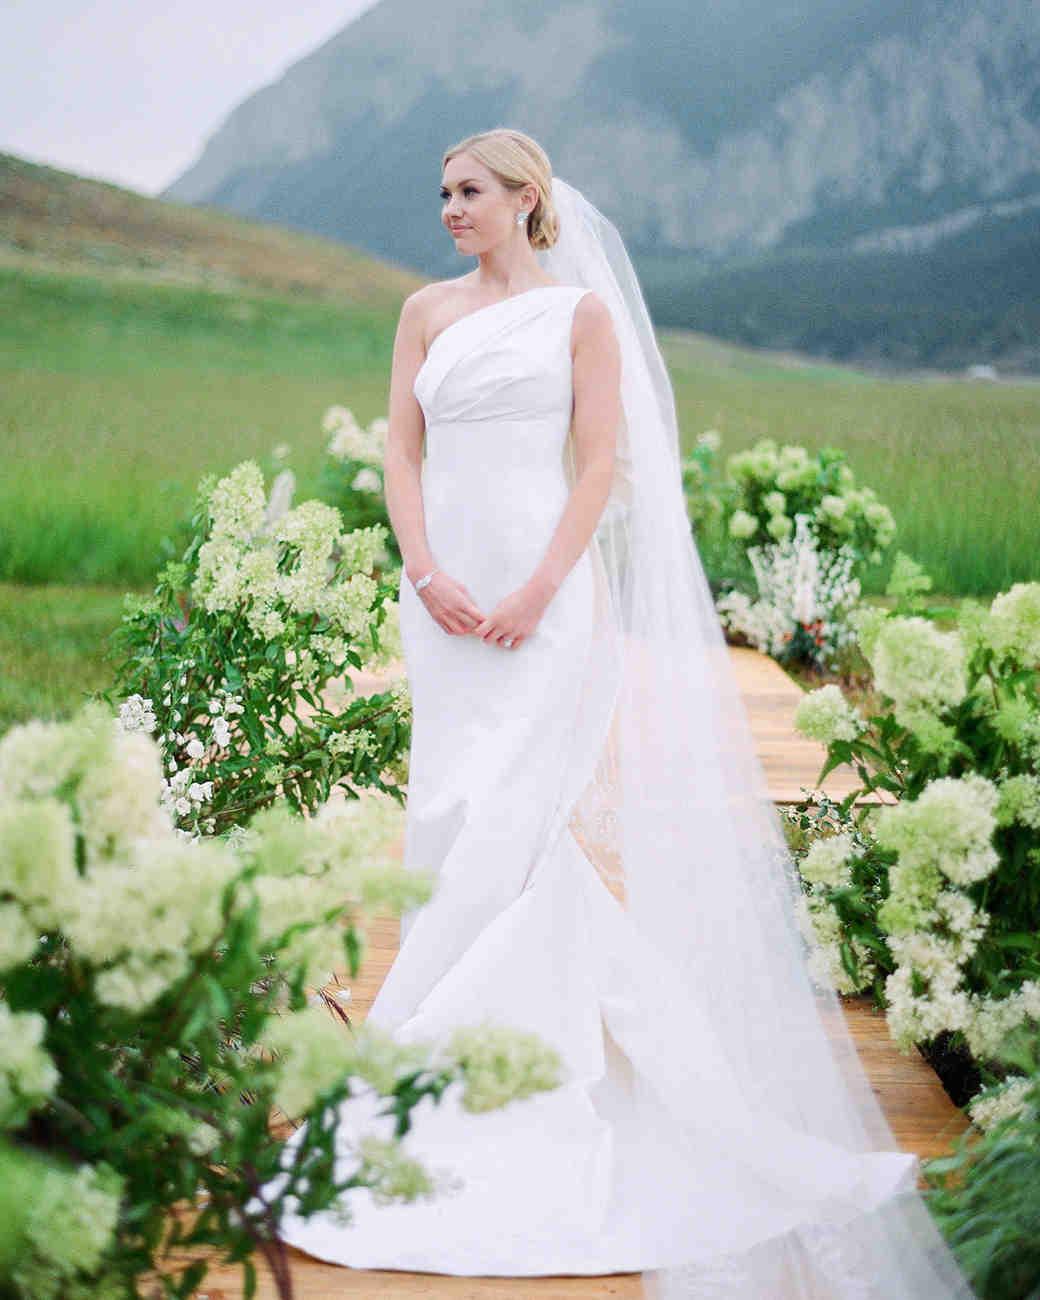 sloan scott wedding bride mountains